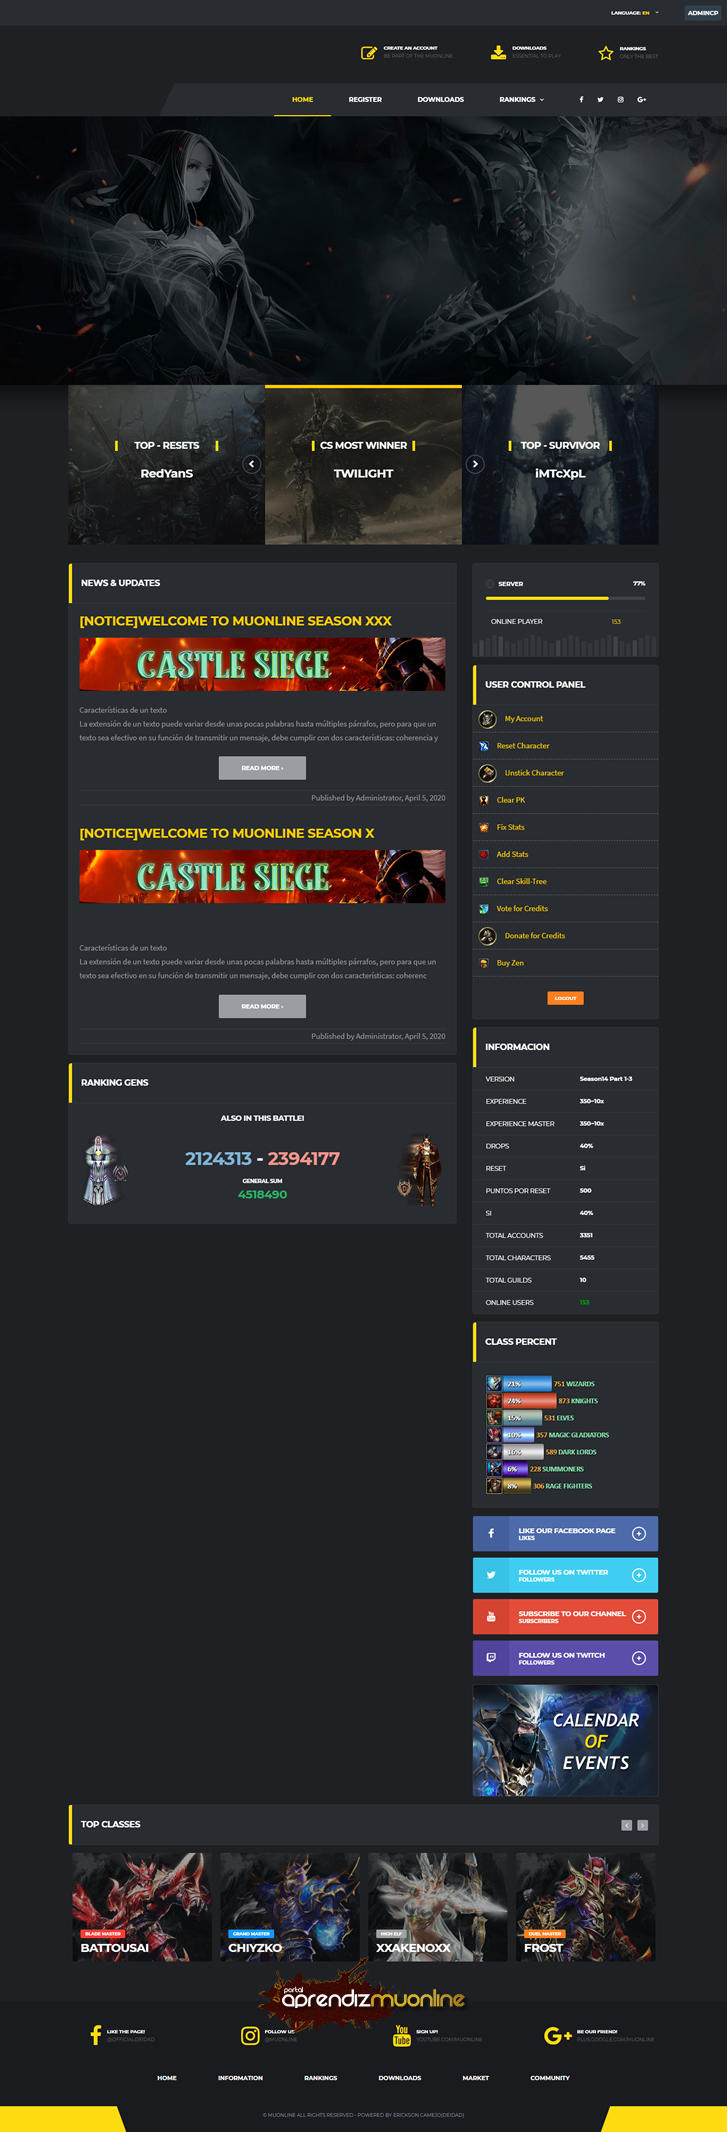 Baixar Web Dark Hero Season 16 Mu Online, Site para Mu Online, web compativel com mu online ate Season 16, web engine template 1.2.0, baixar web para mu online gratis